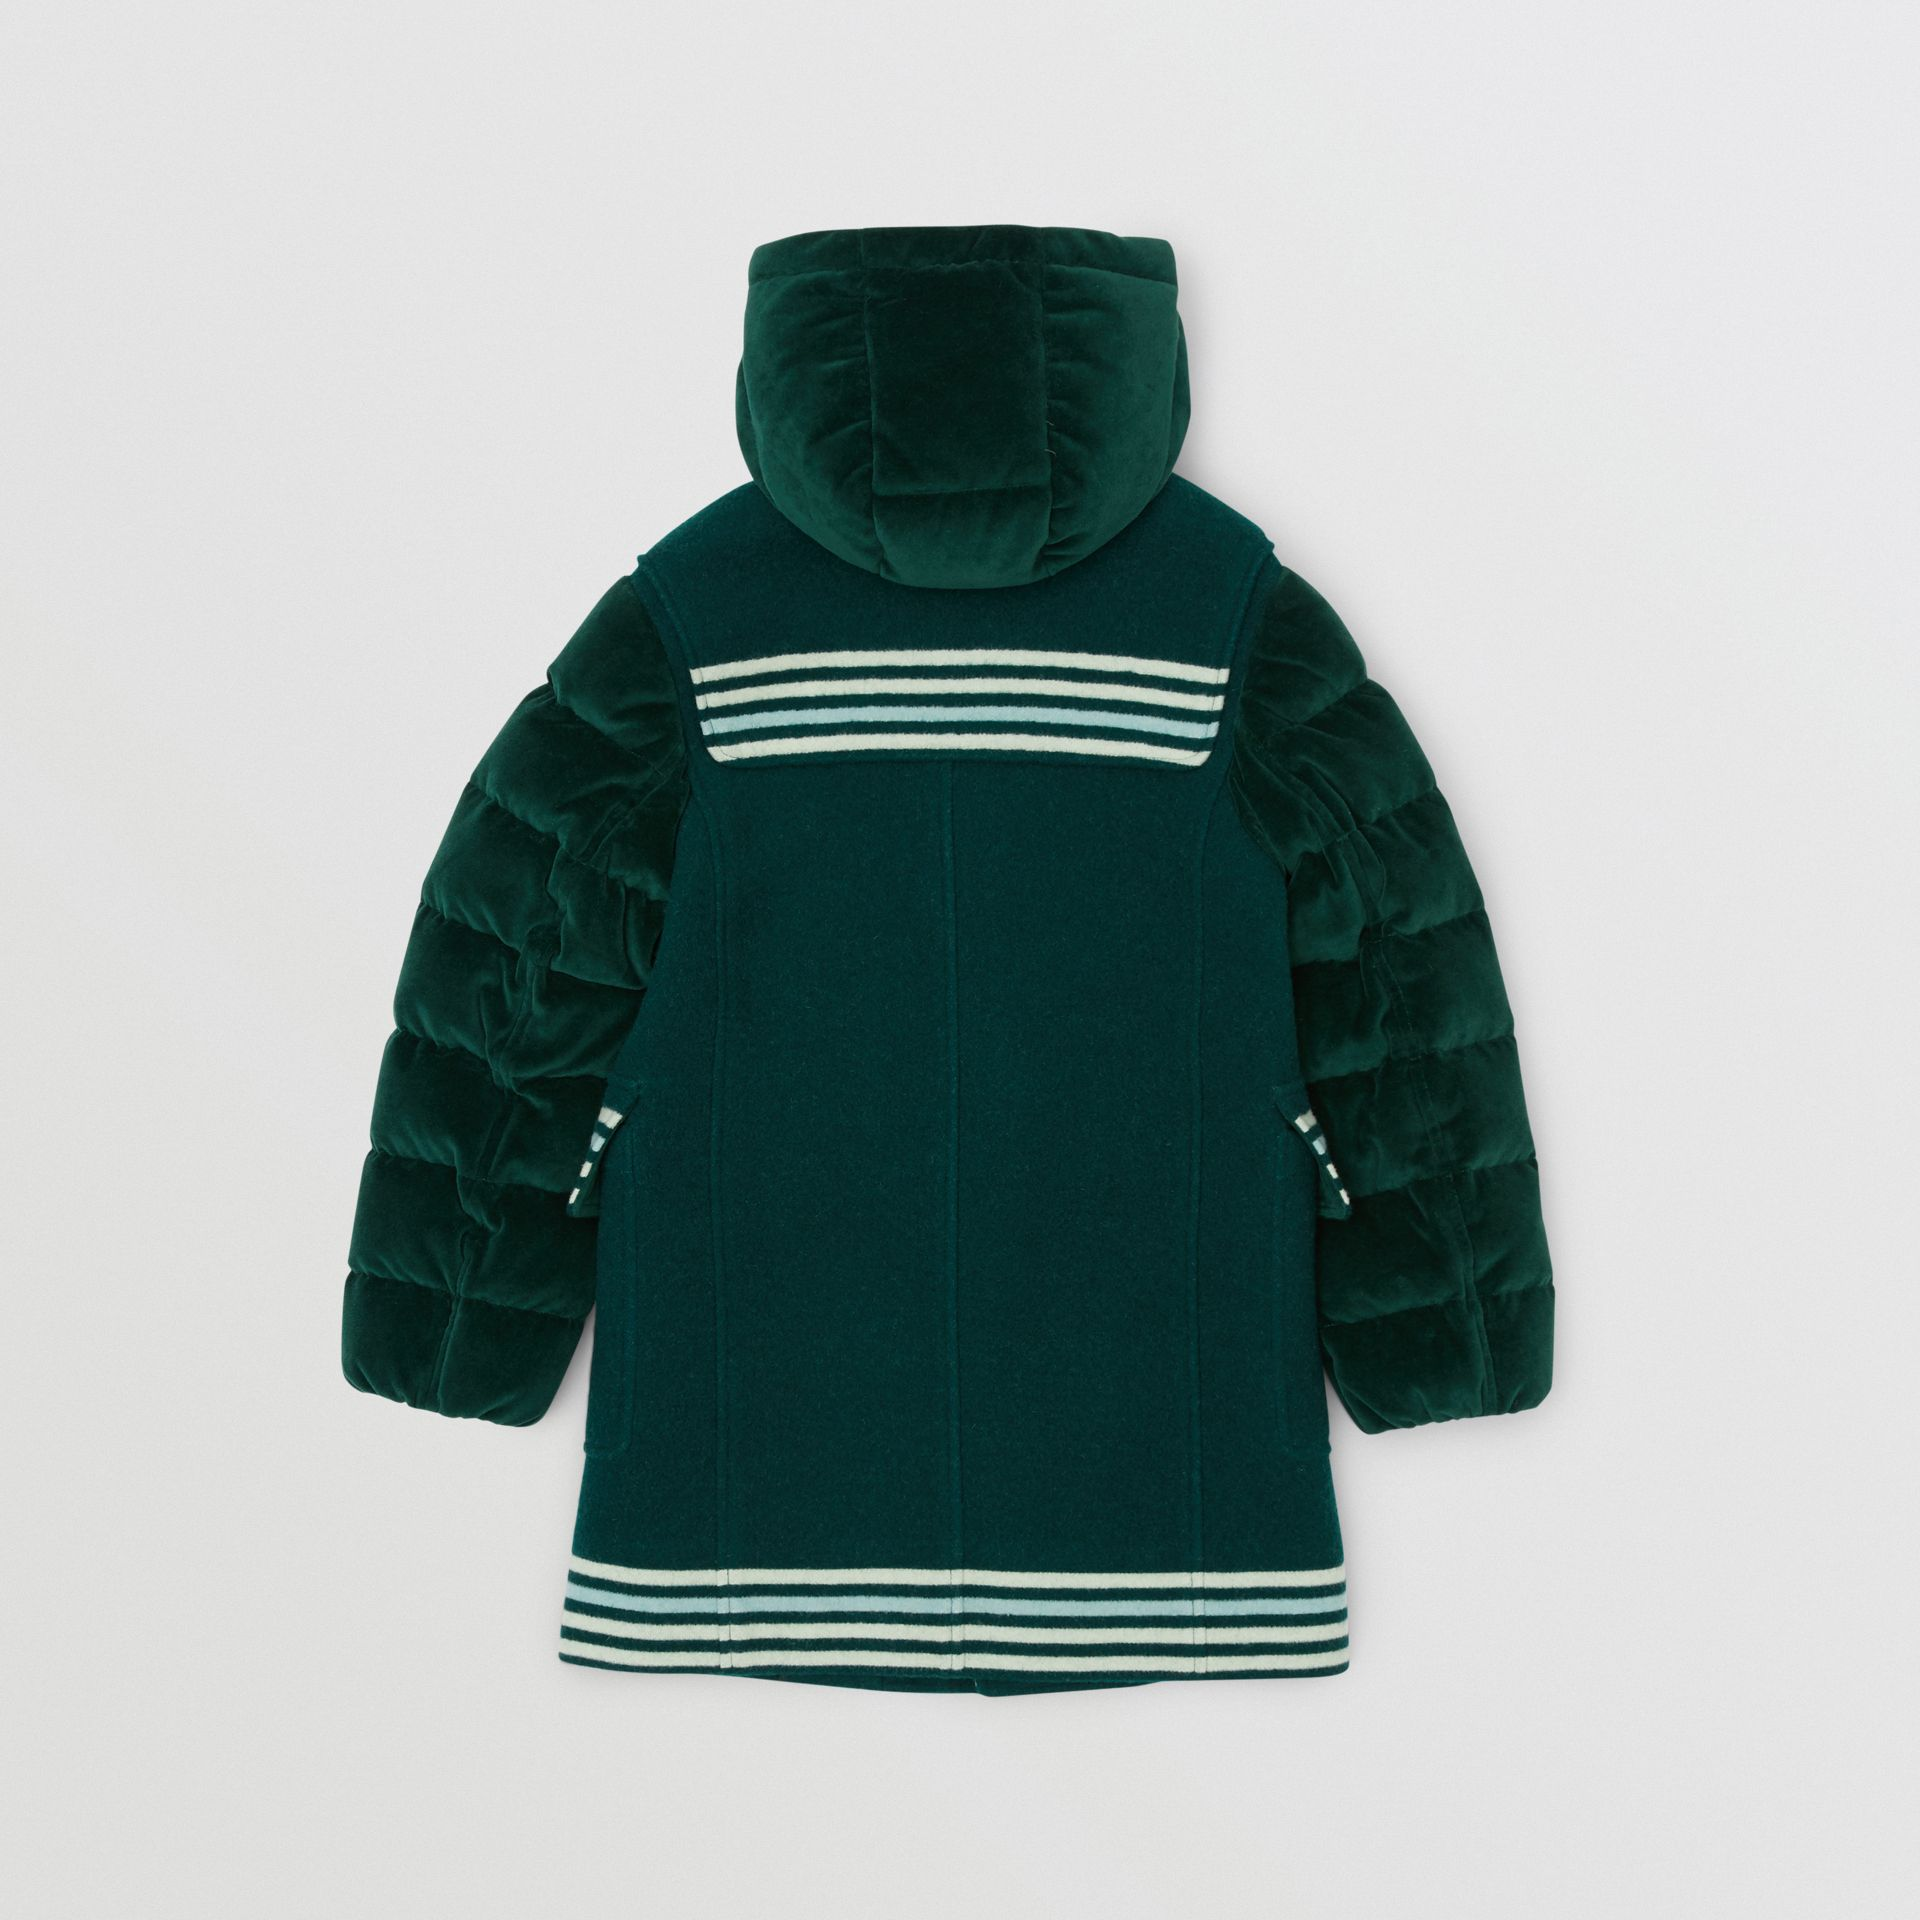 Velvet Puffer Detail Wool Duffle Coat in Dark Pine Green | Burberry - gallery image 3